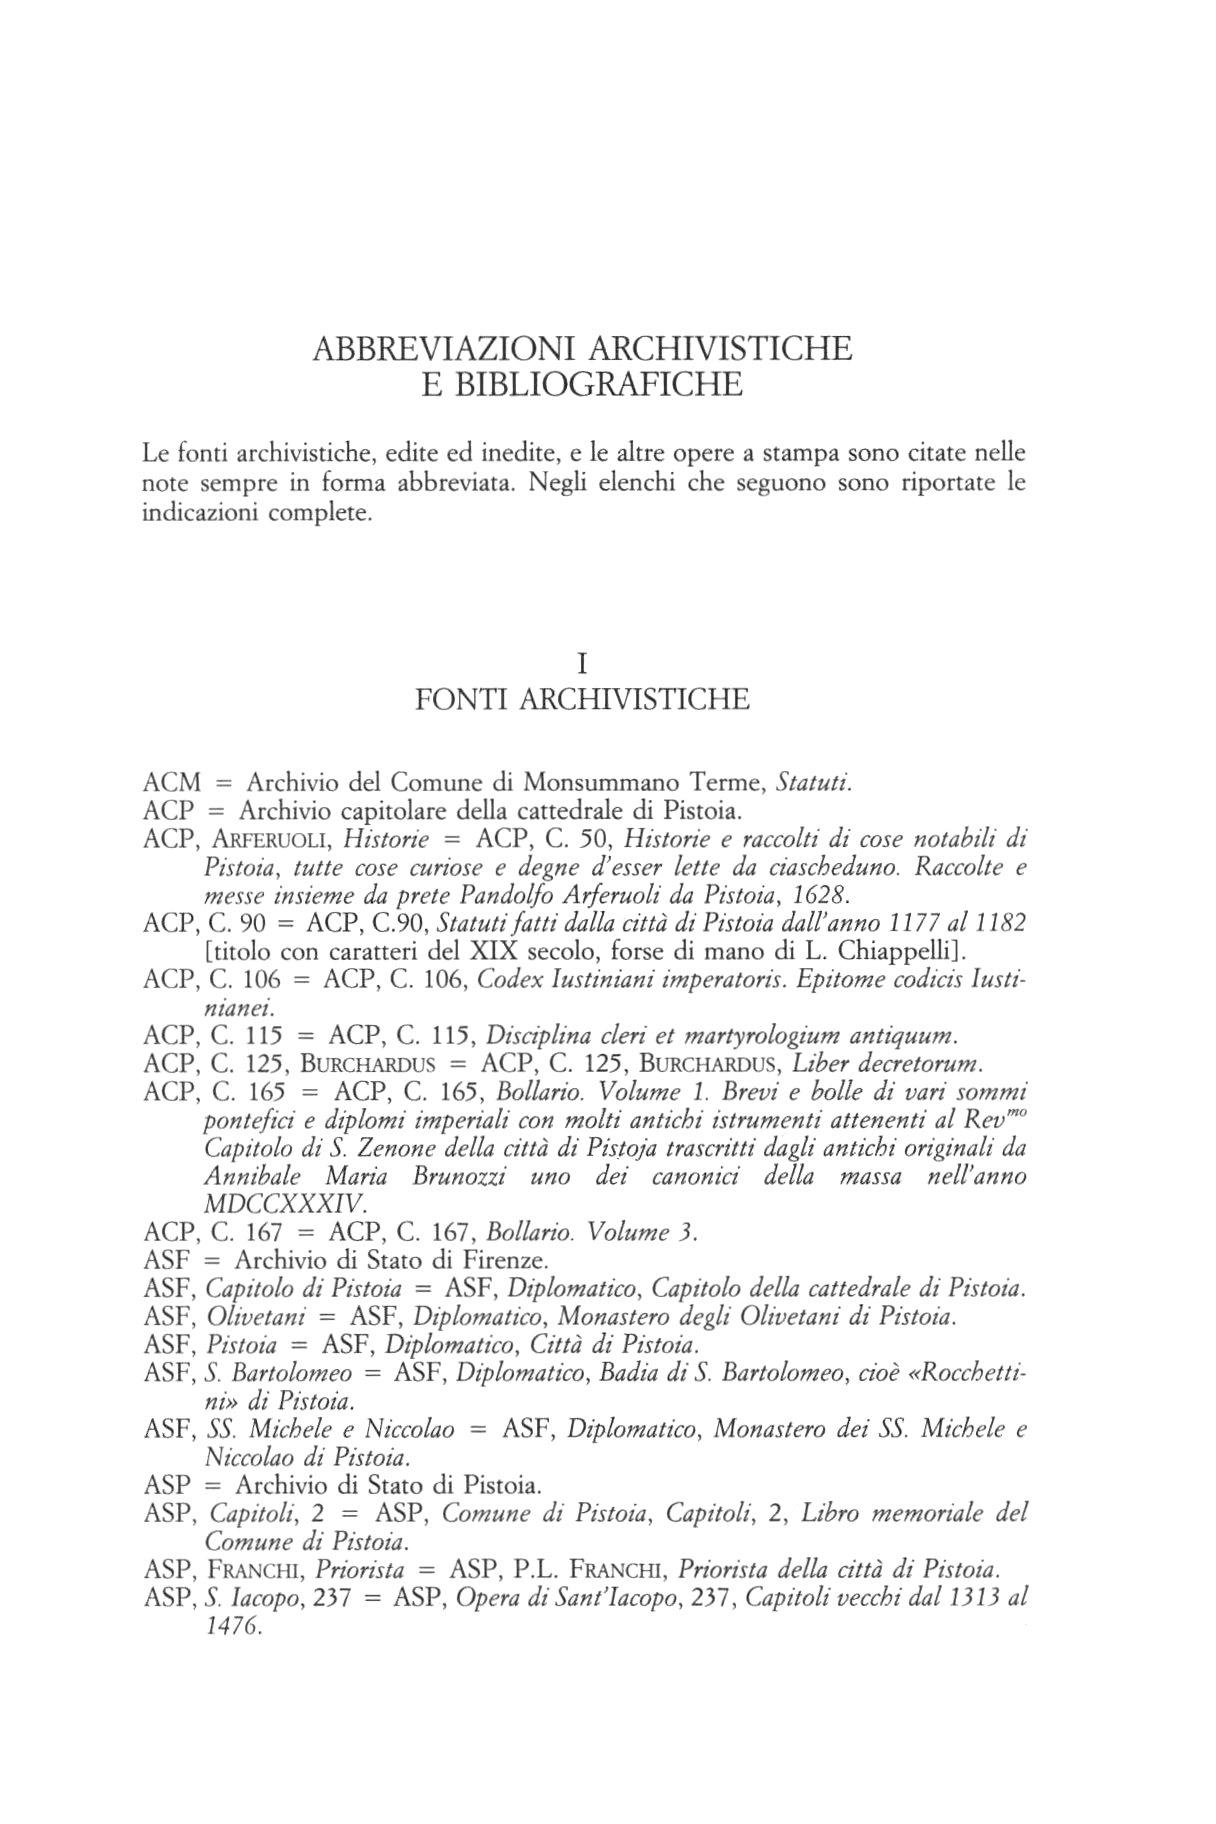 statuti pistoiesi del sec.XII 0117.jpg